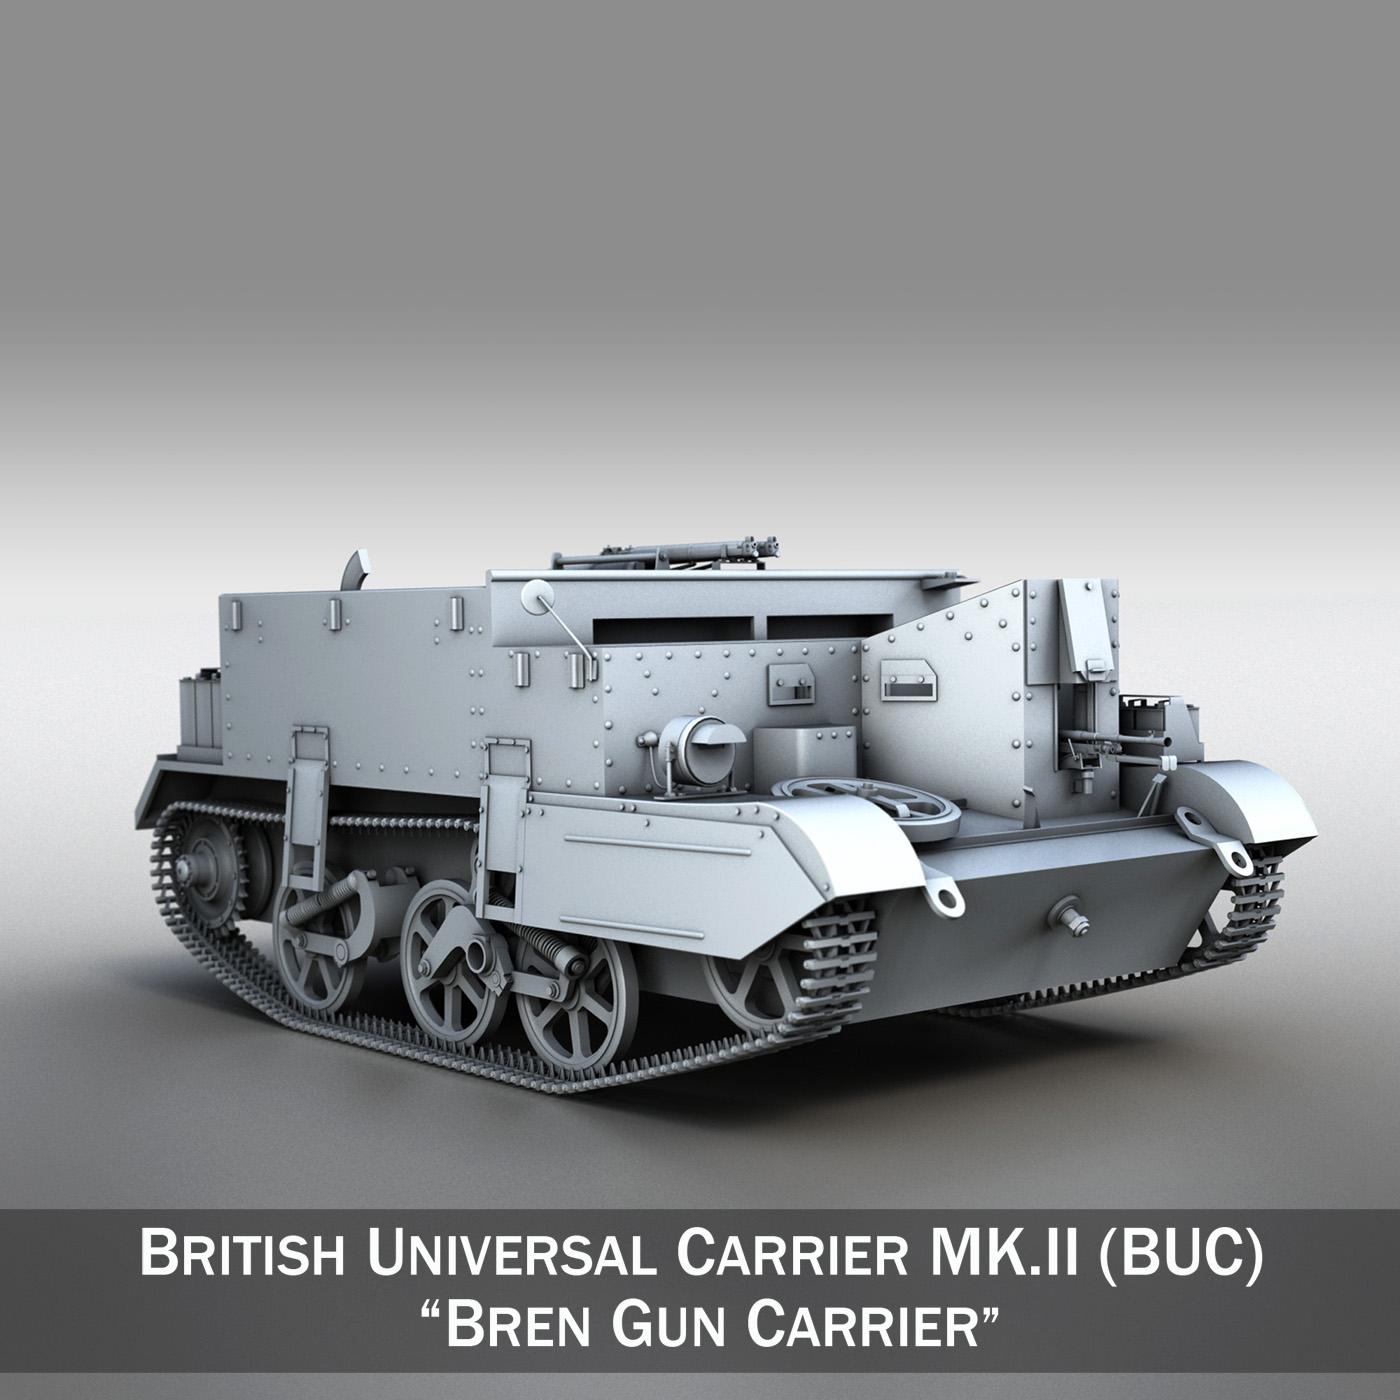 Universal Carrier MK II - Bren Gun Carrier 3d model 3ds fbx c4d lwo lws lw obj 272958